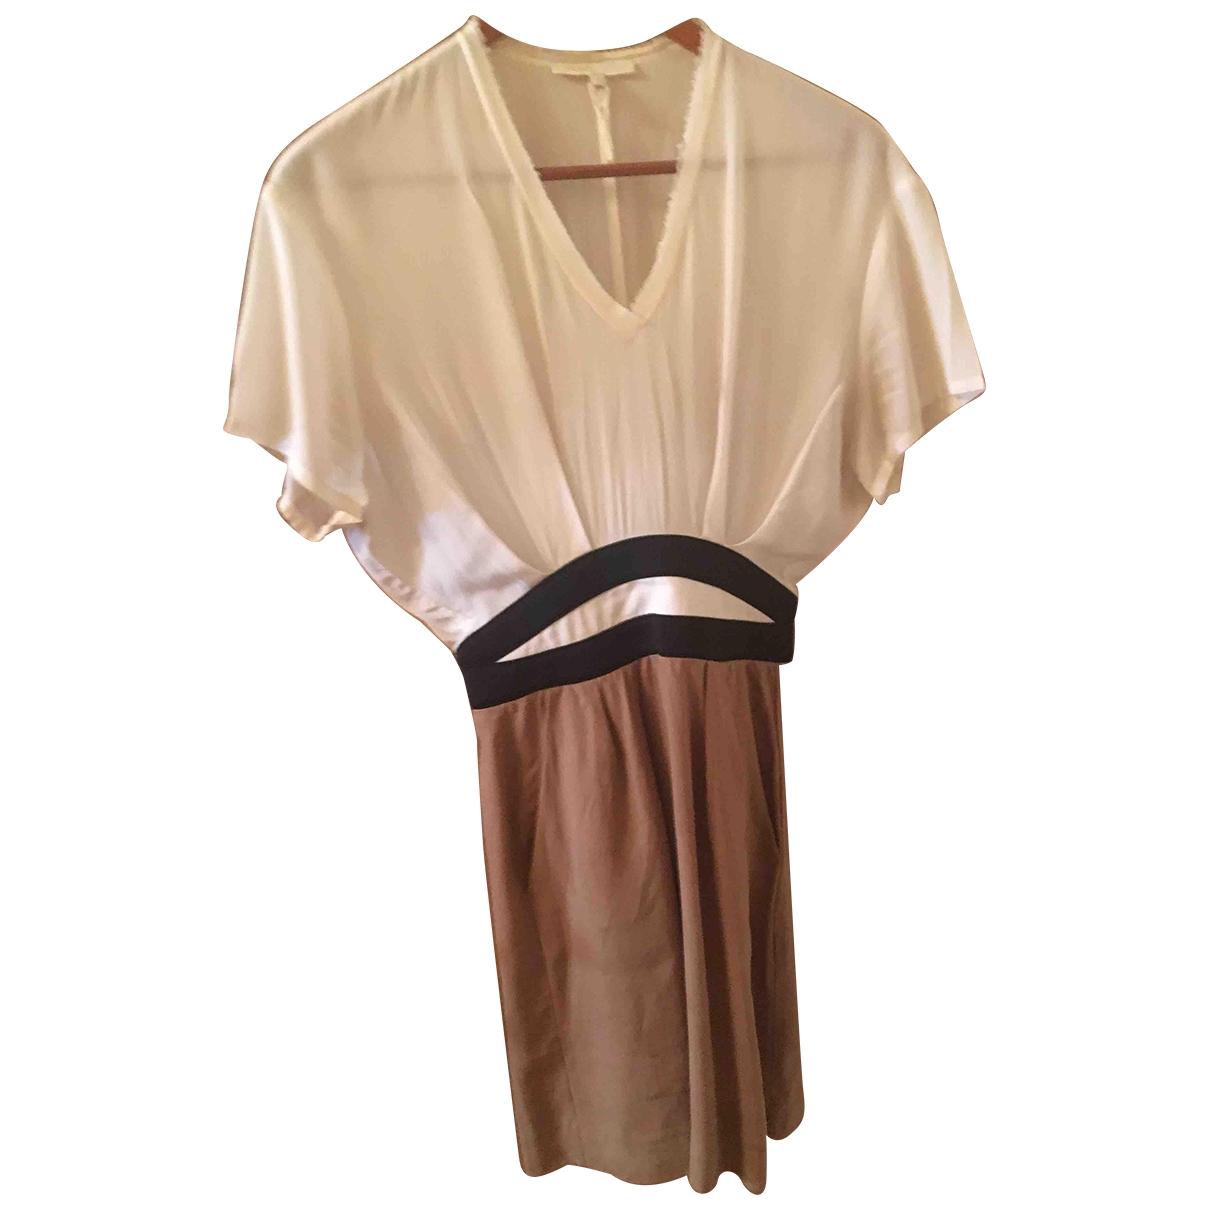 Maje \N Camel Cotton dress for Women 36 FR